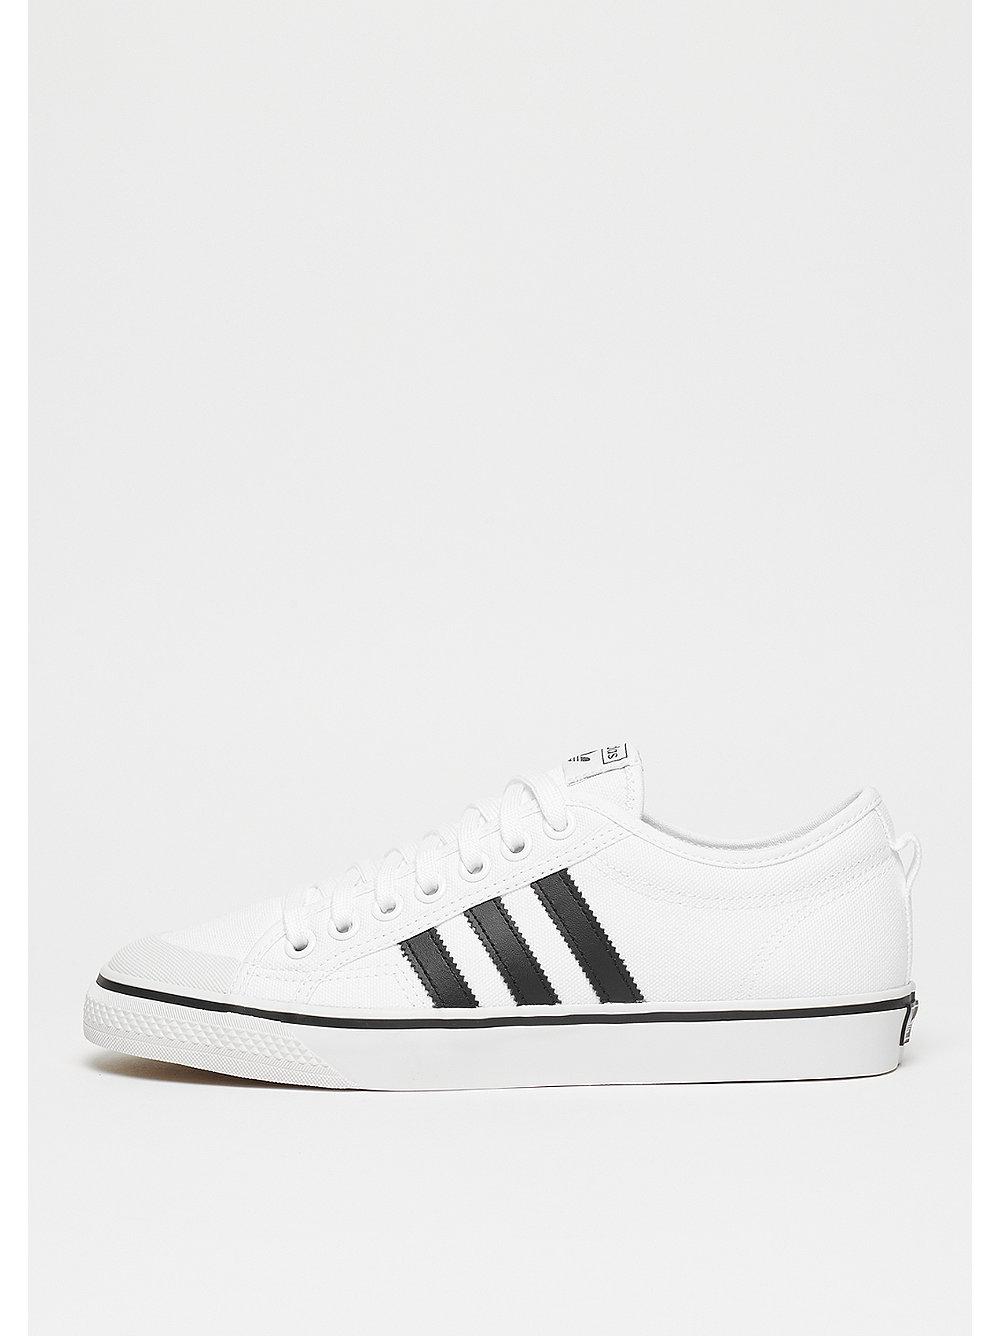 adidas Nizza ftwr white/core black/crystal white